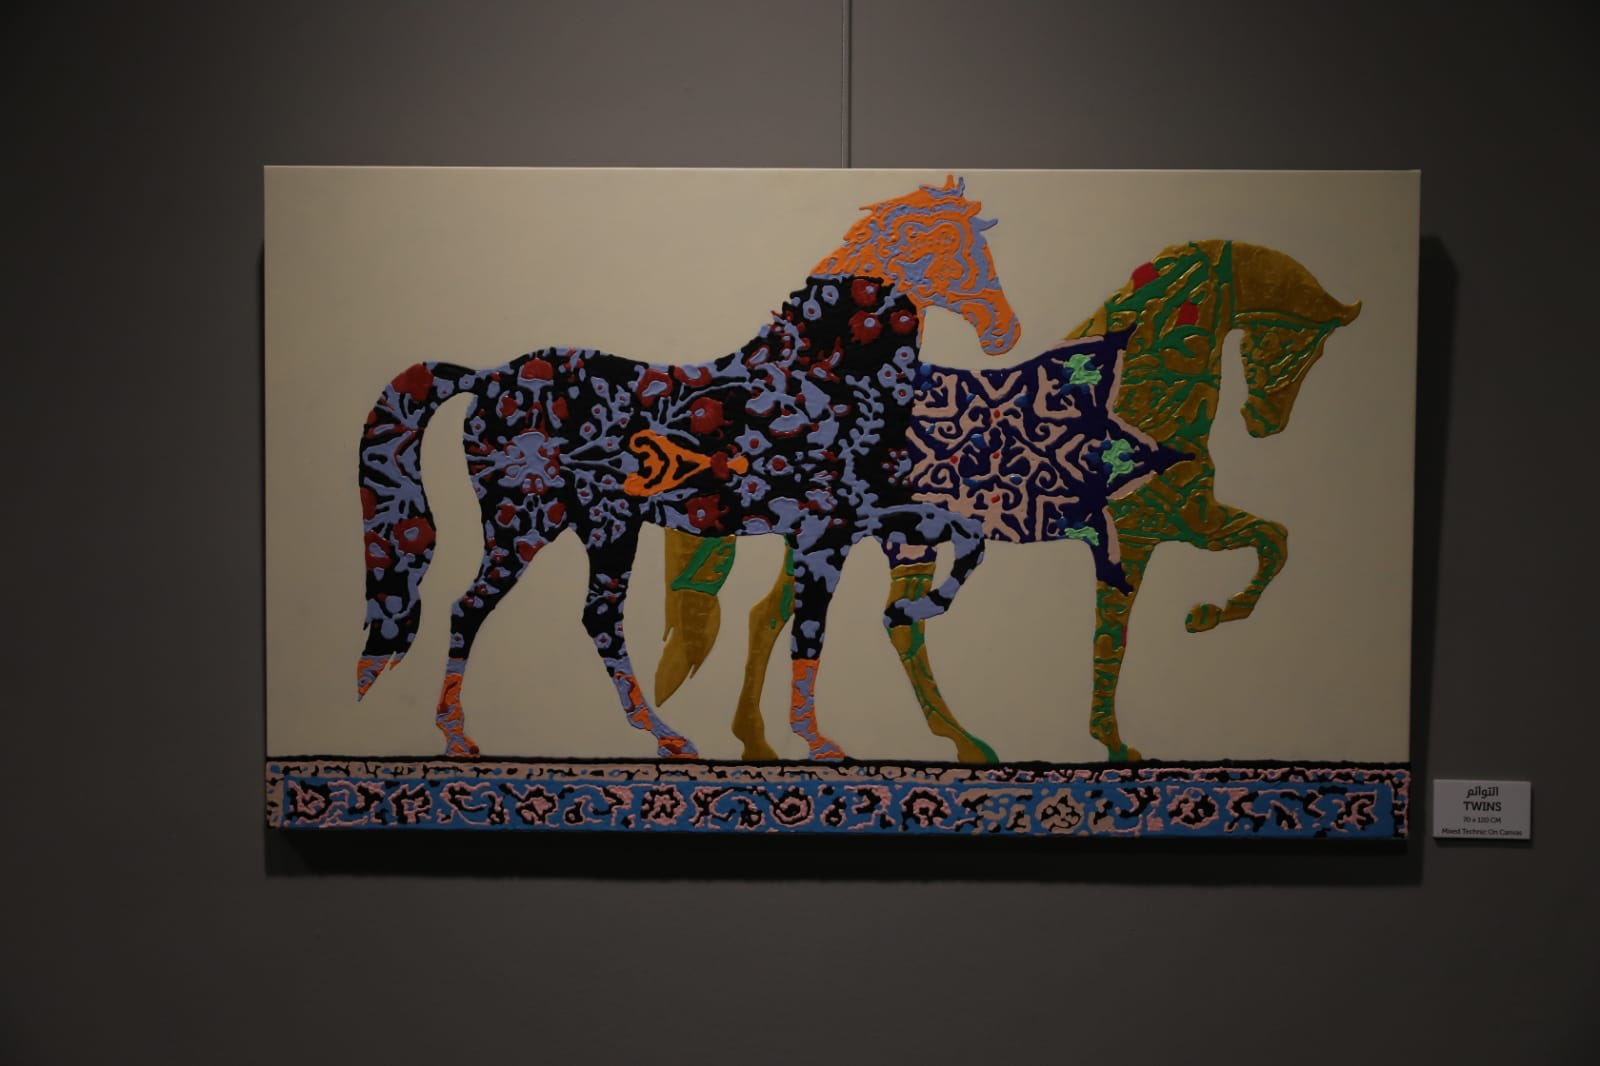 Italian artist bridges East and West through artworks